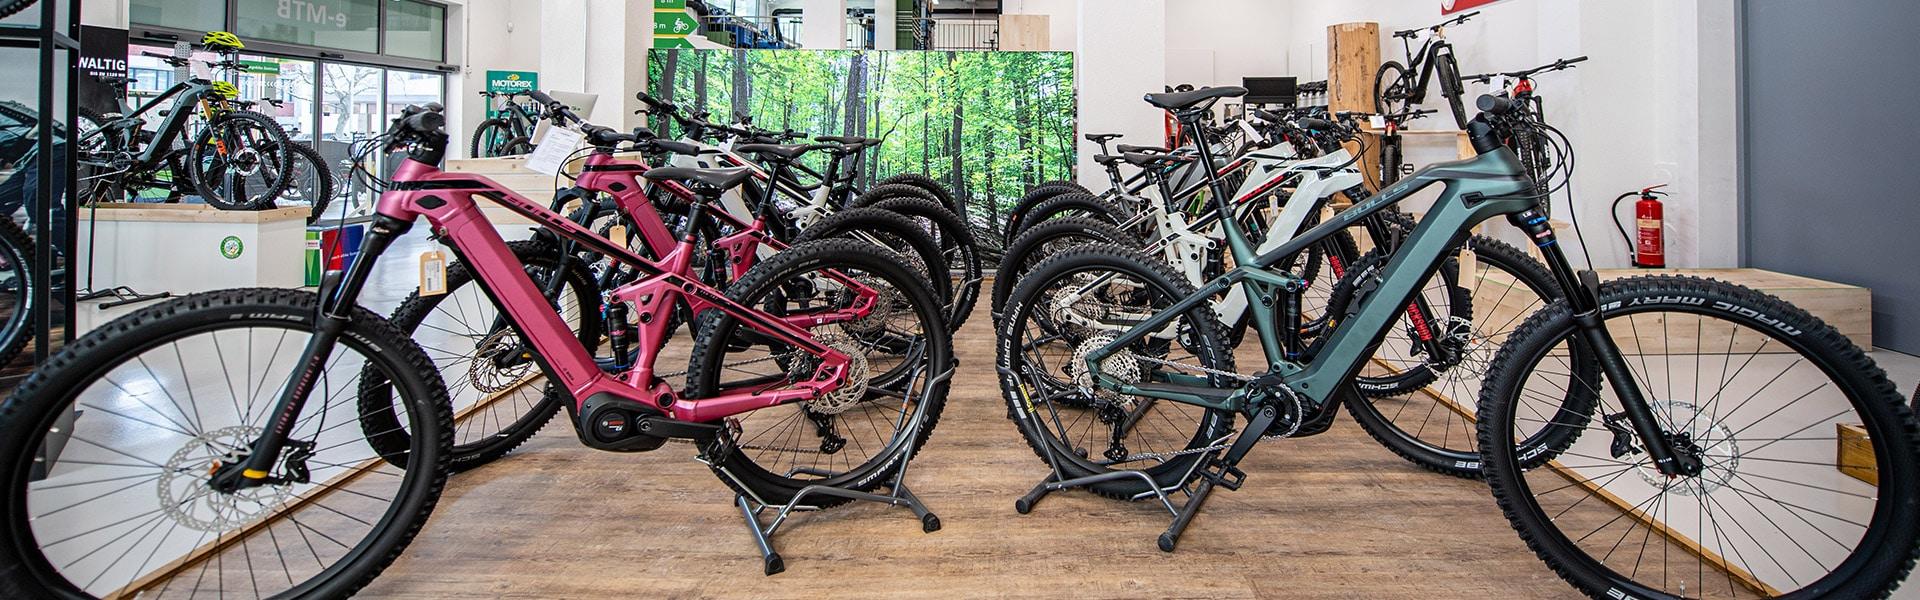 e-motion e-Bike Welt Dietikon Innenansicht